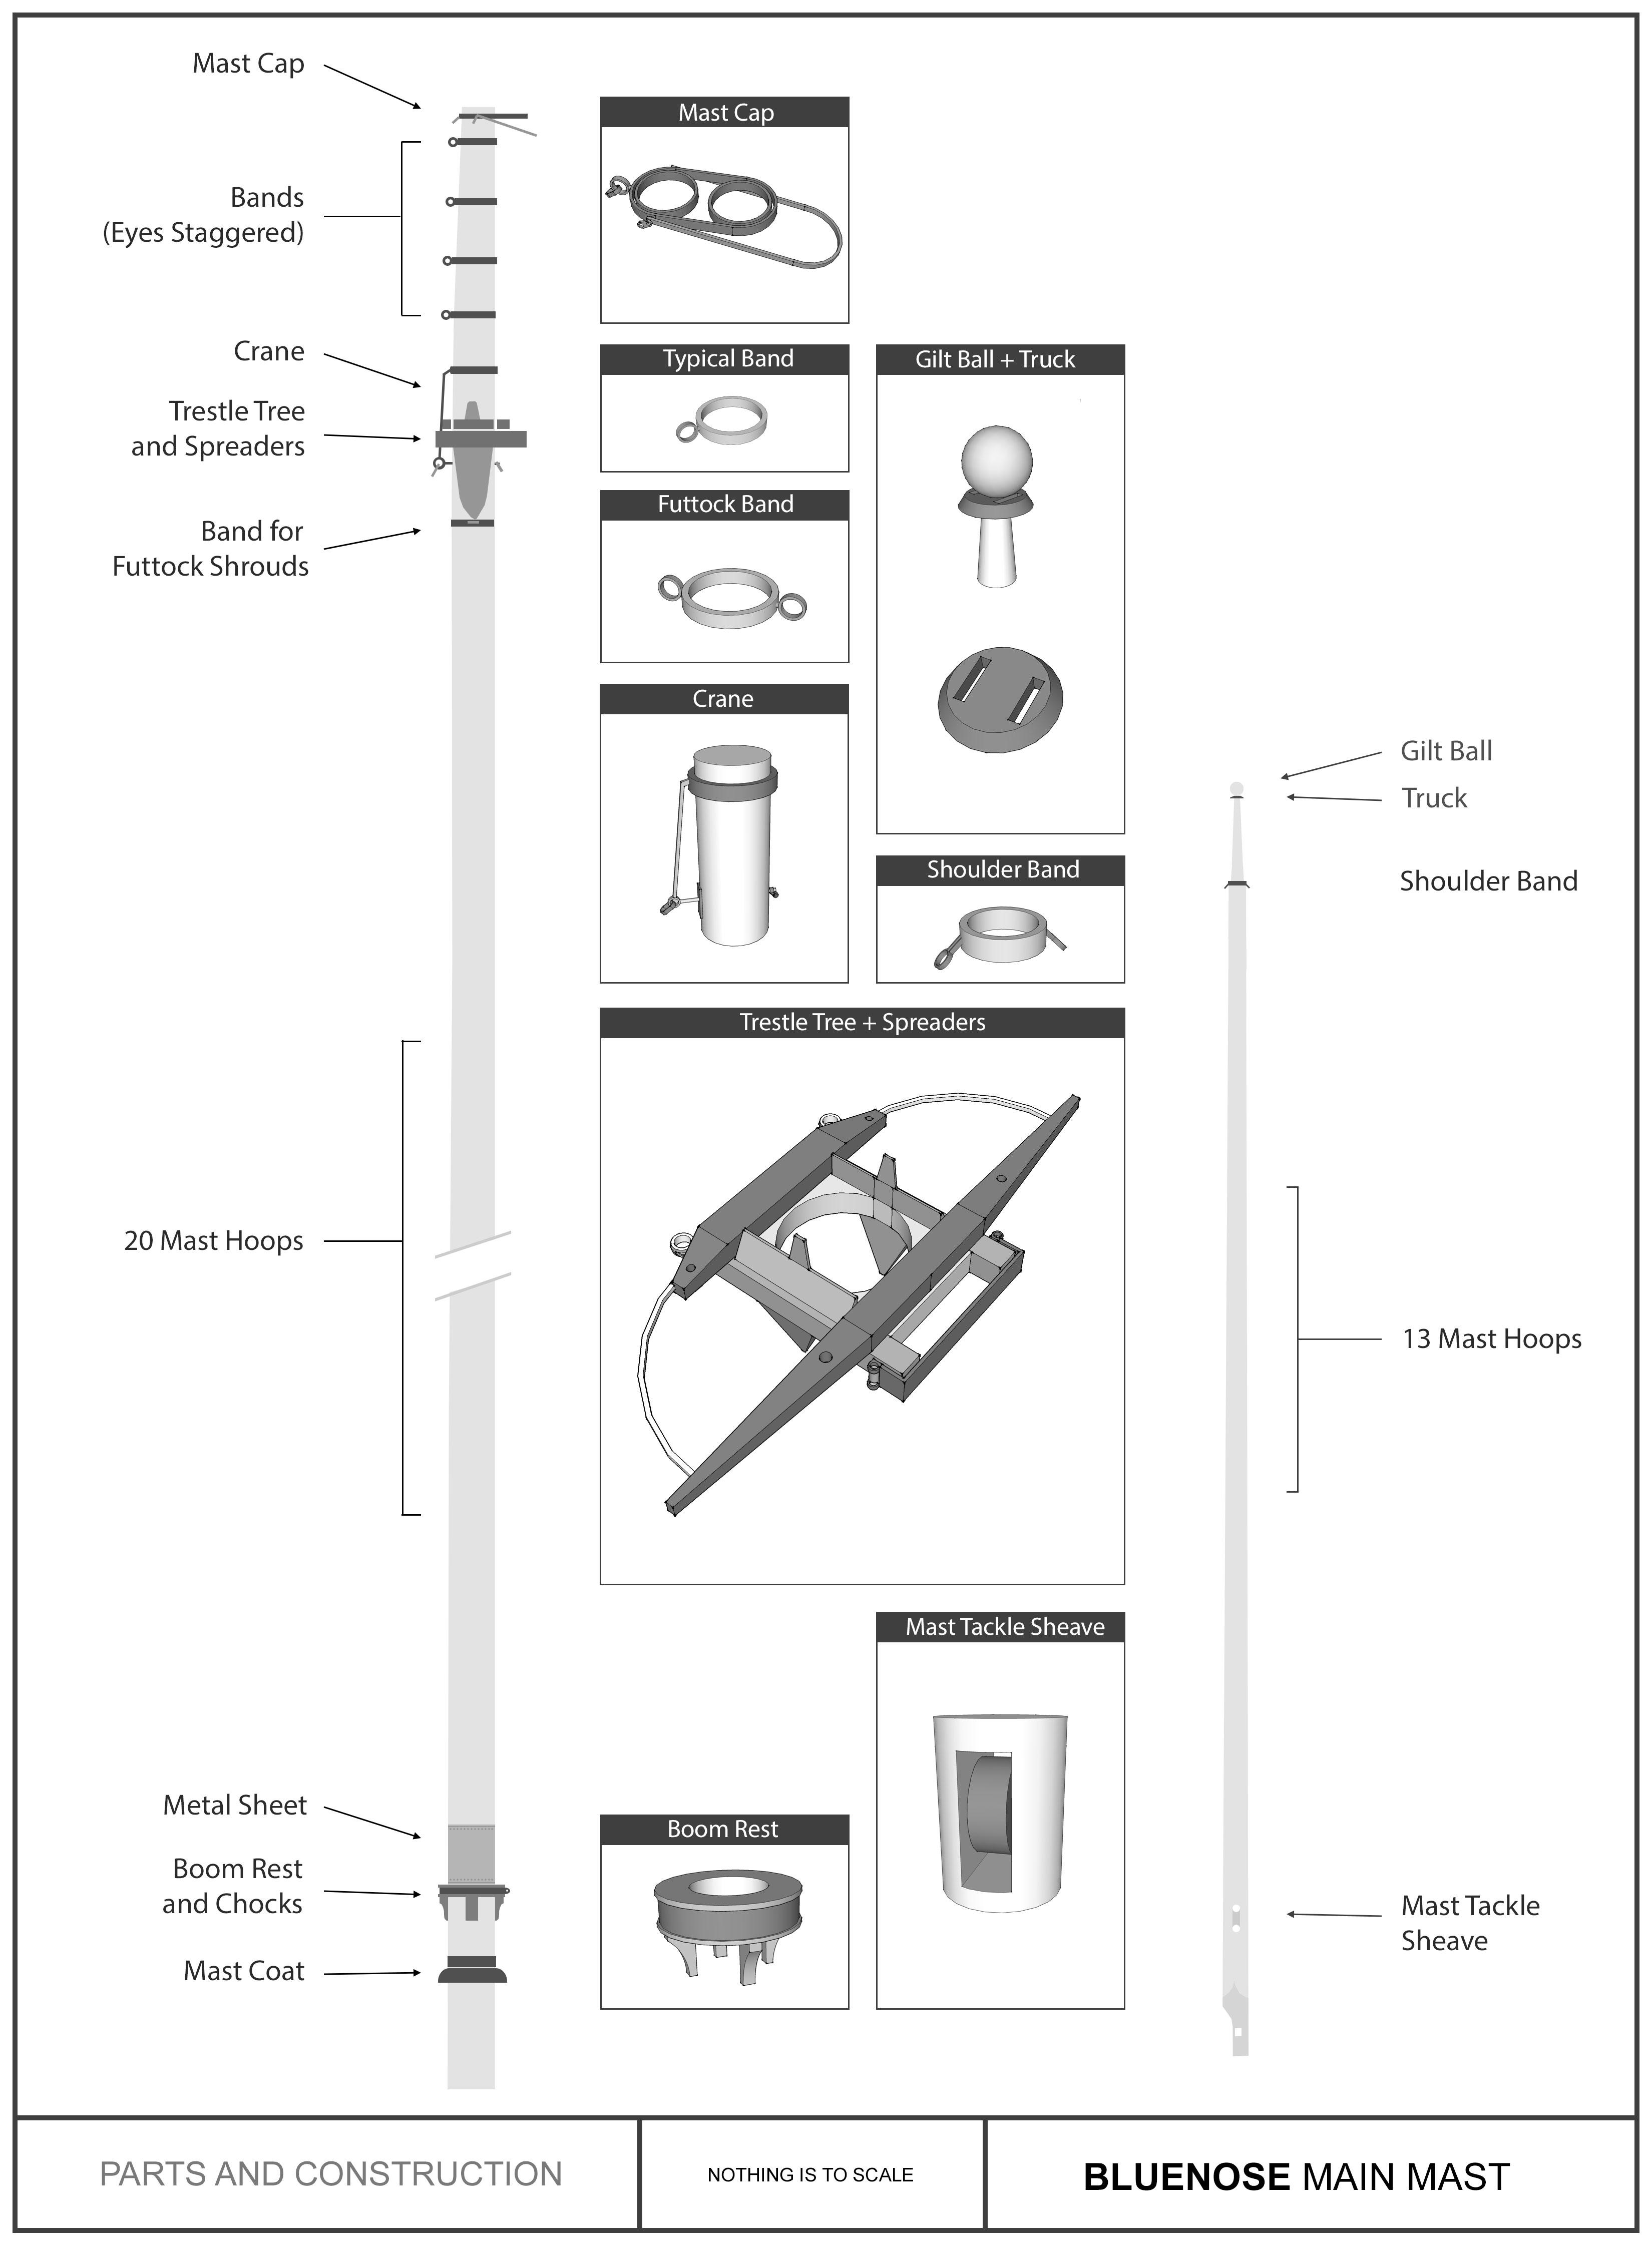 Masts---Construction-2